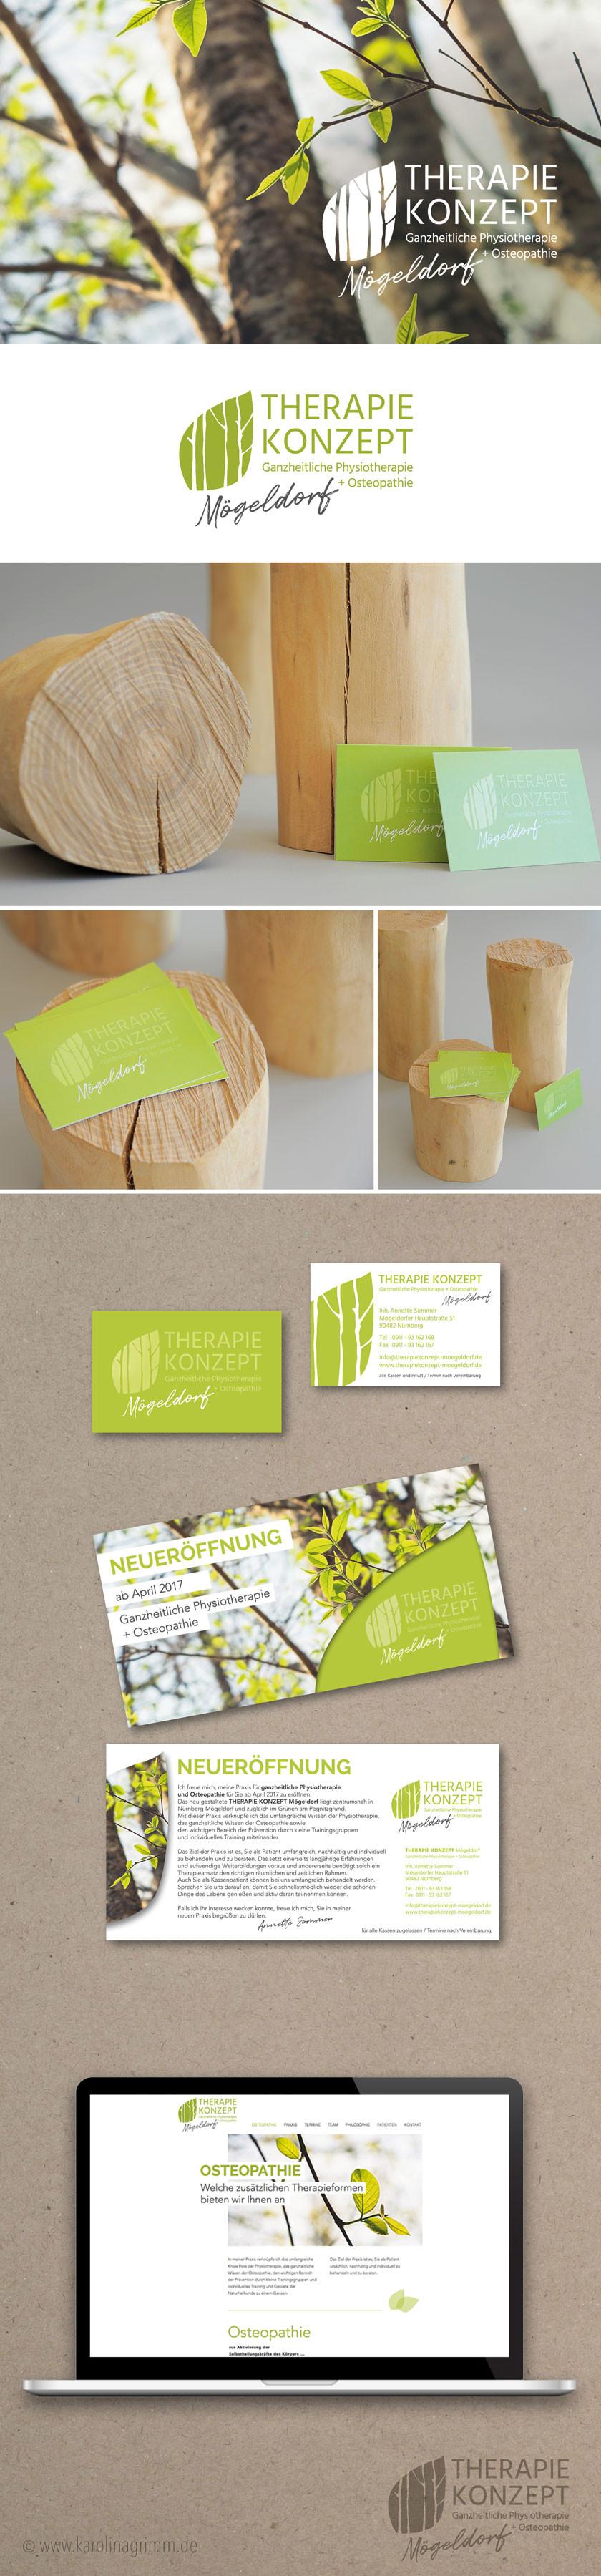 THERAPIEKONZEPT Mögeldorf | Logo | Flyer | Visitenkarte |Webdesign